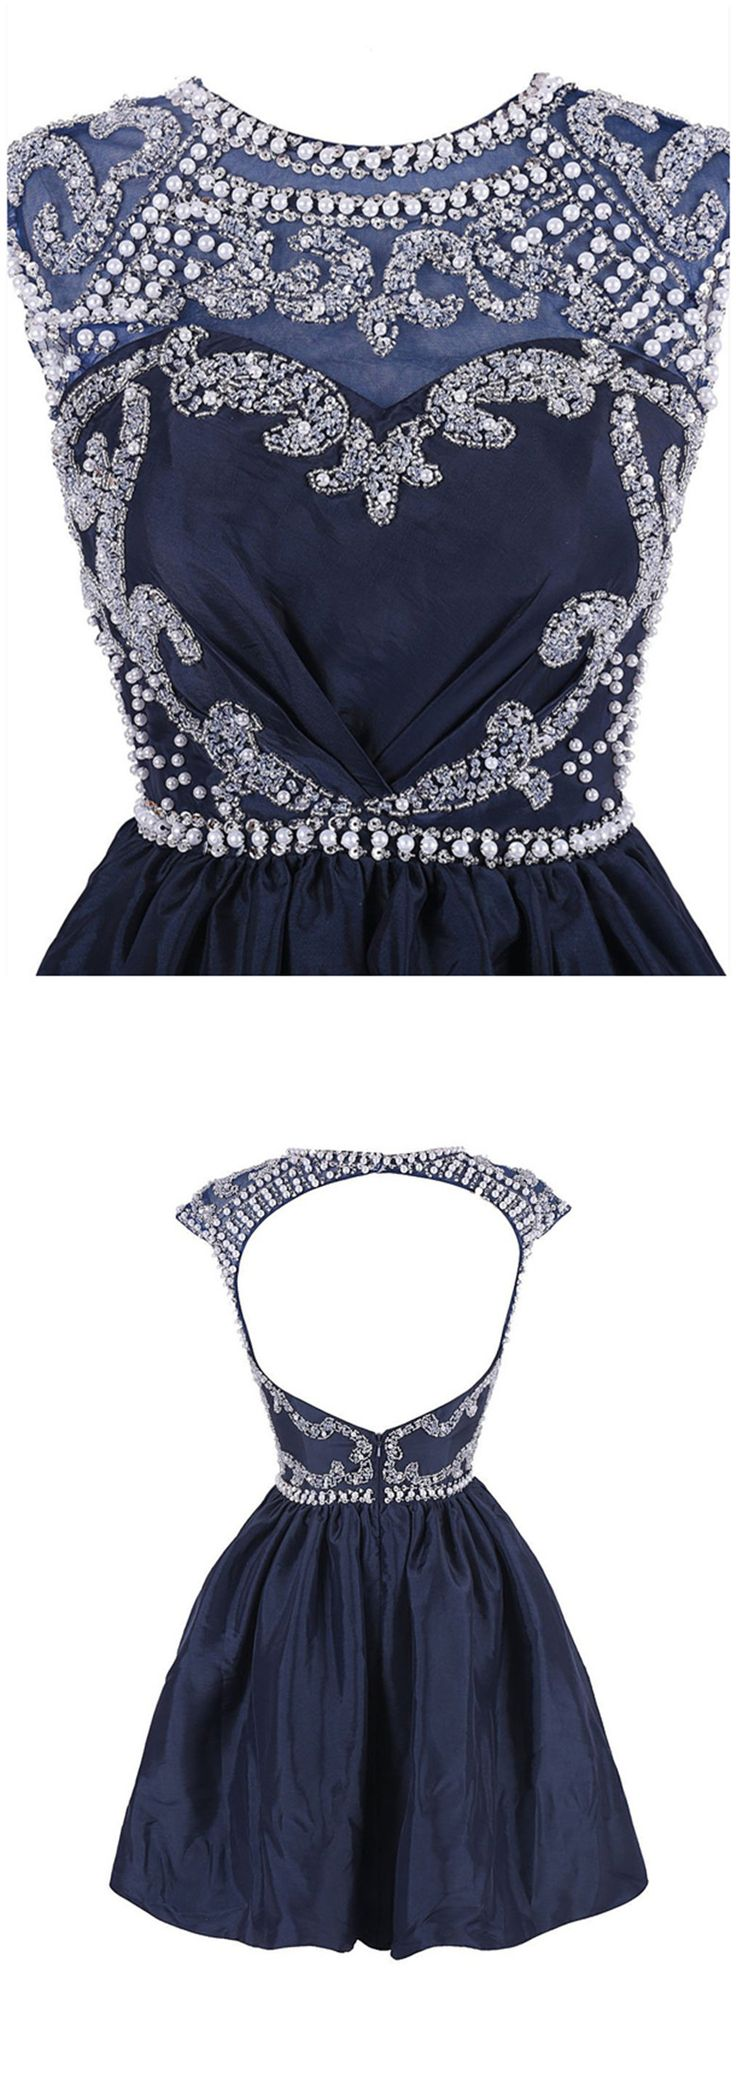 2016 homecoming dress,elegant homecoming dress,exquisite homecoming dress,dark navy homecoming dress,homecoming dress with beades